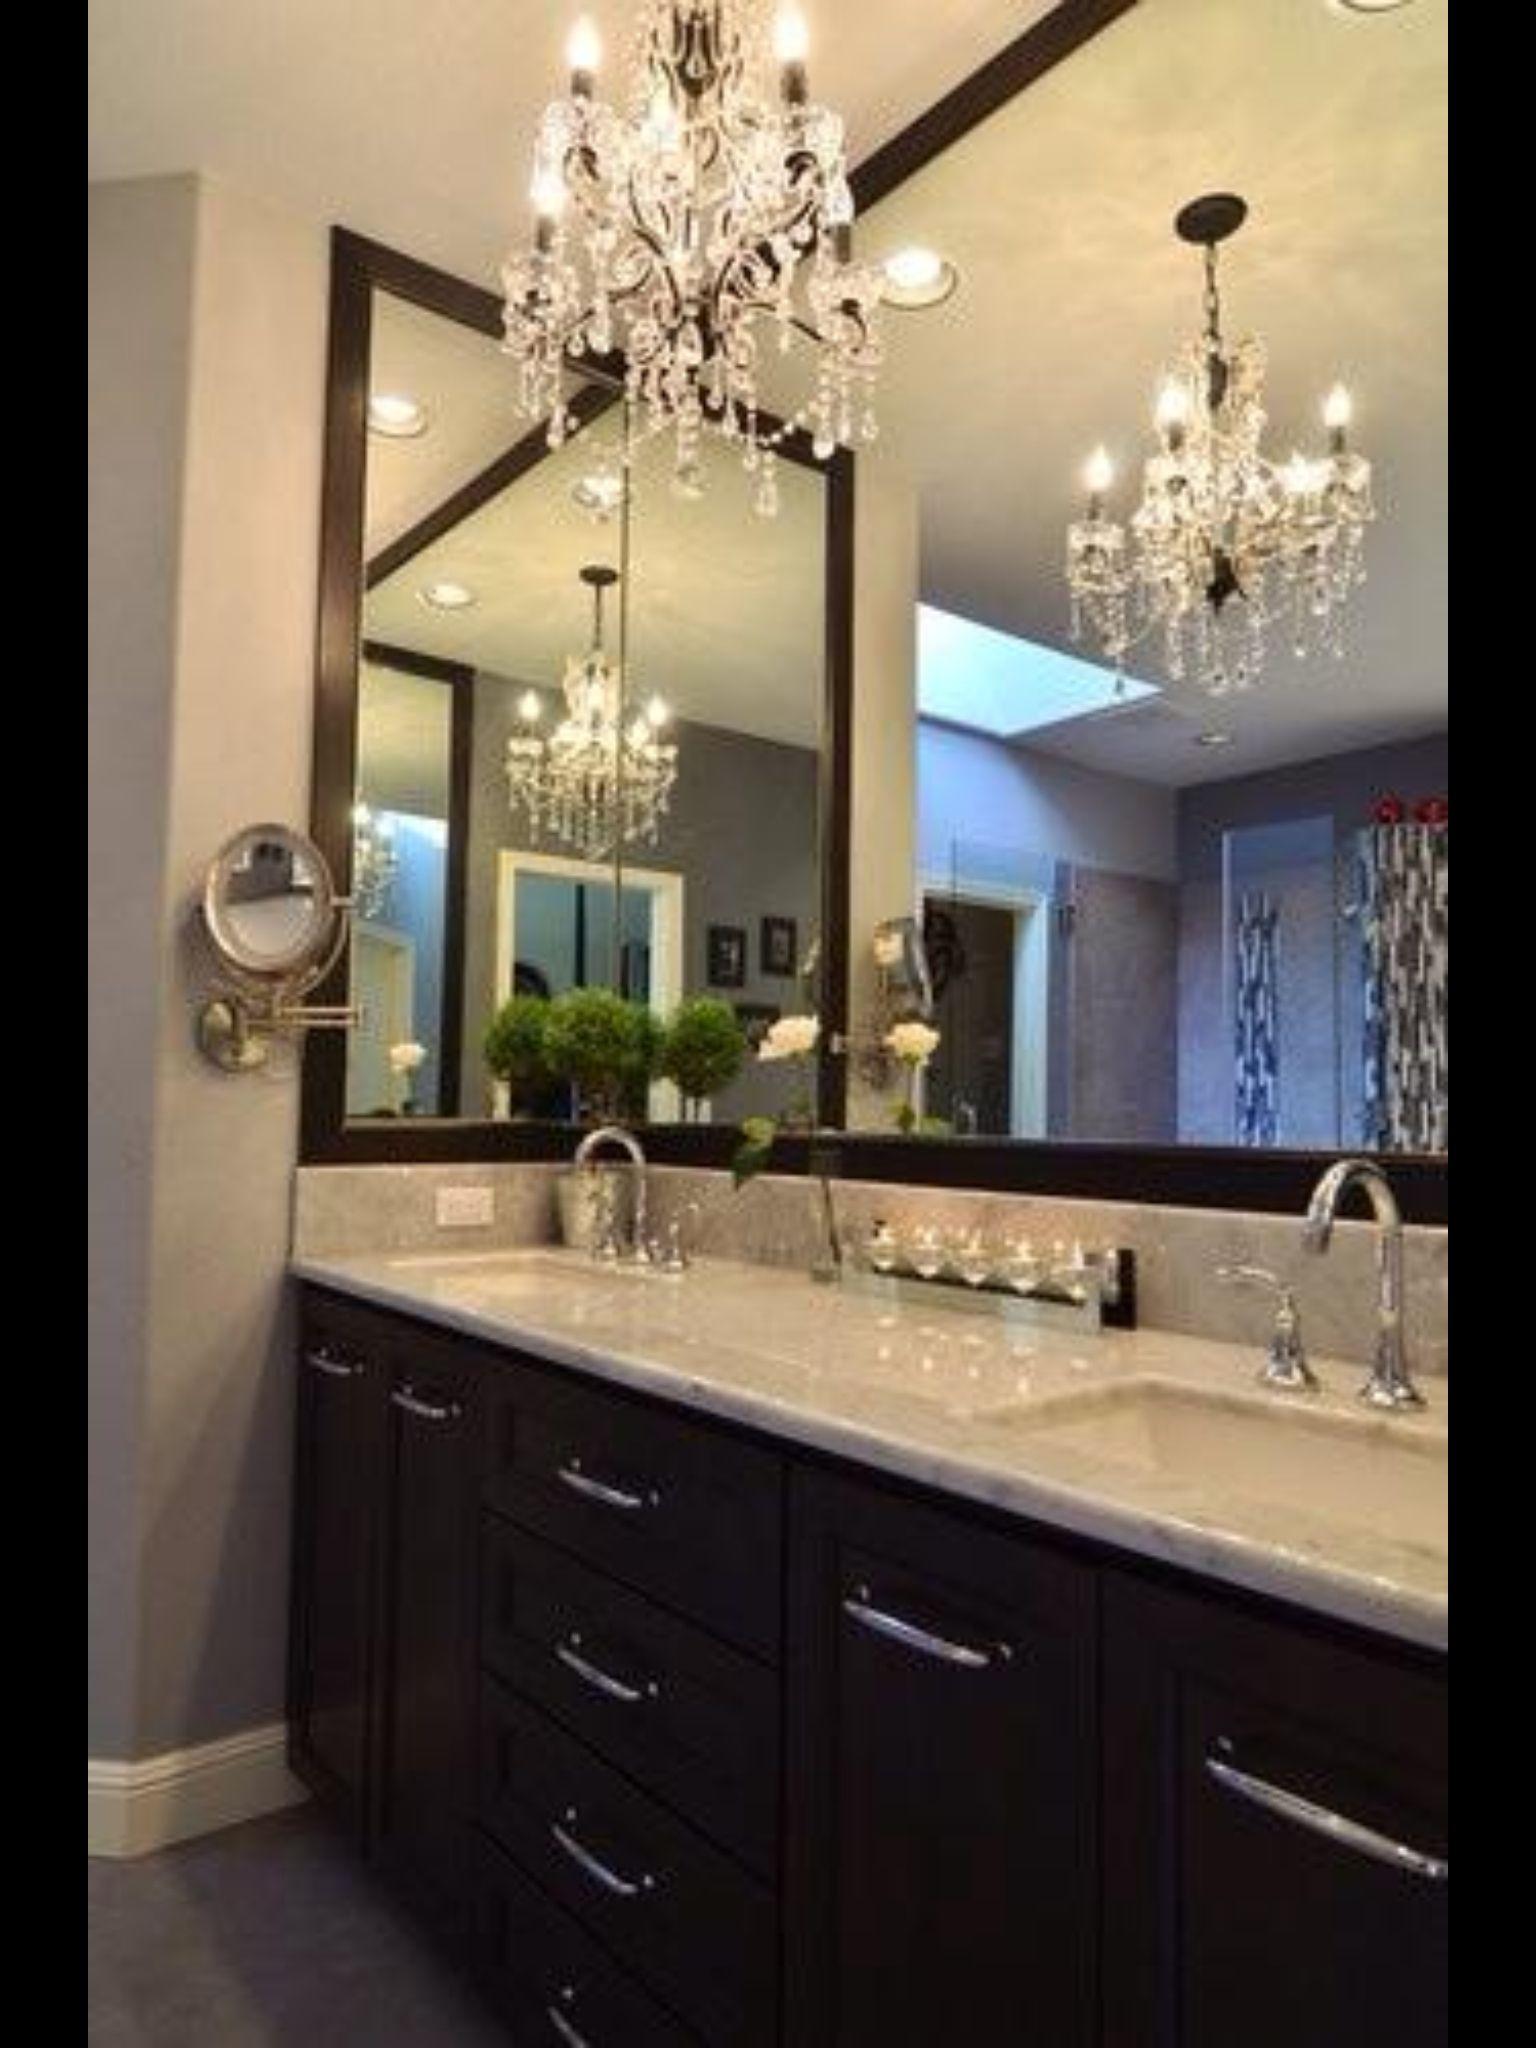 Awesome mirror idea ideas for bathroom pinterest beautiful